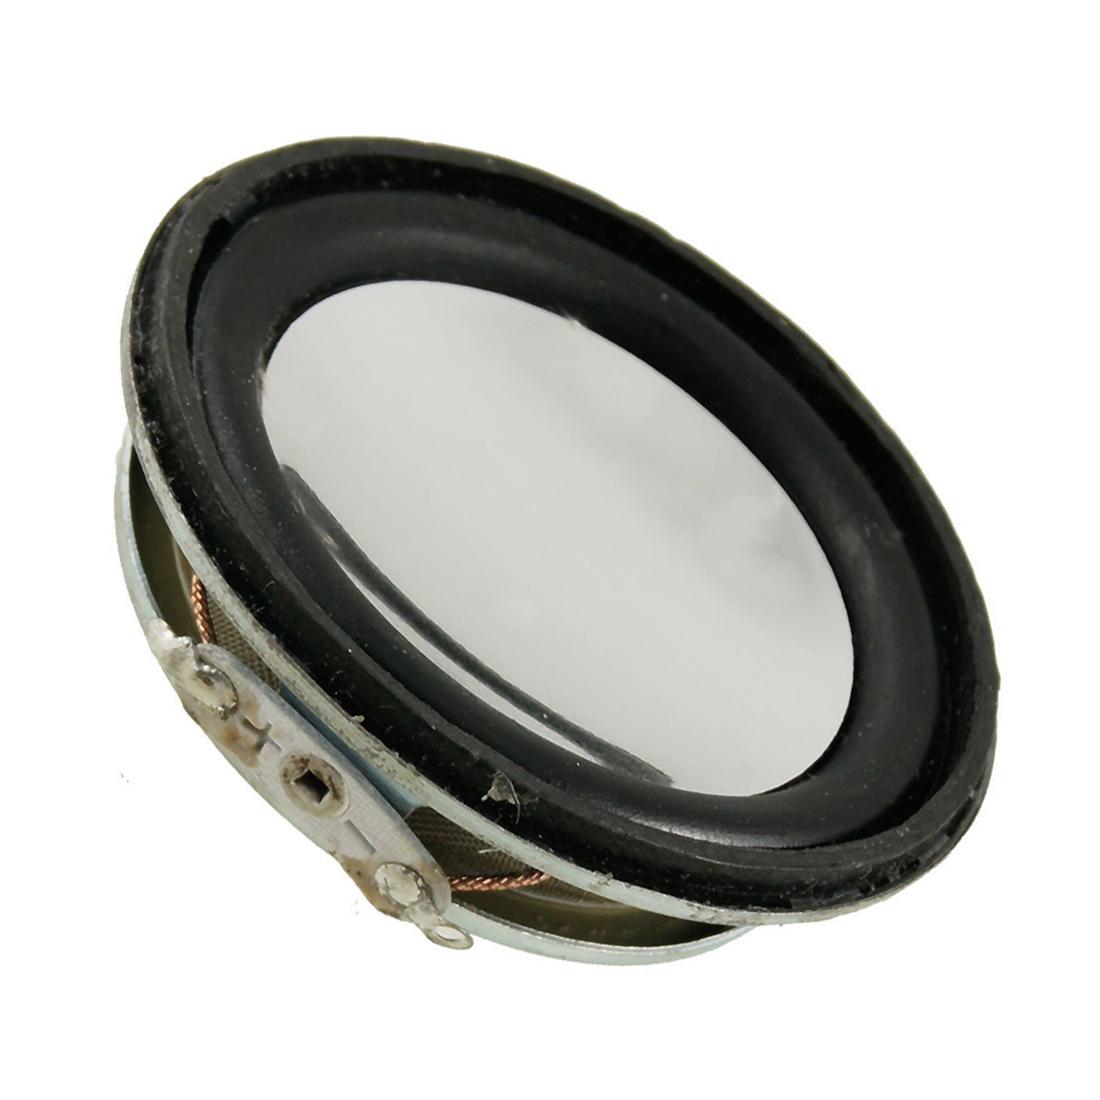 2x(Audio Equipment 4 Ohm 3W 50mm Mounting Dia Horn Midrange Speaker S8)